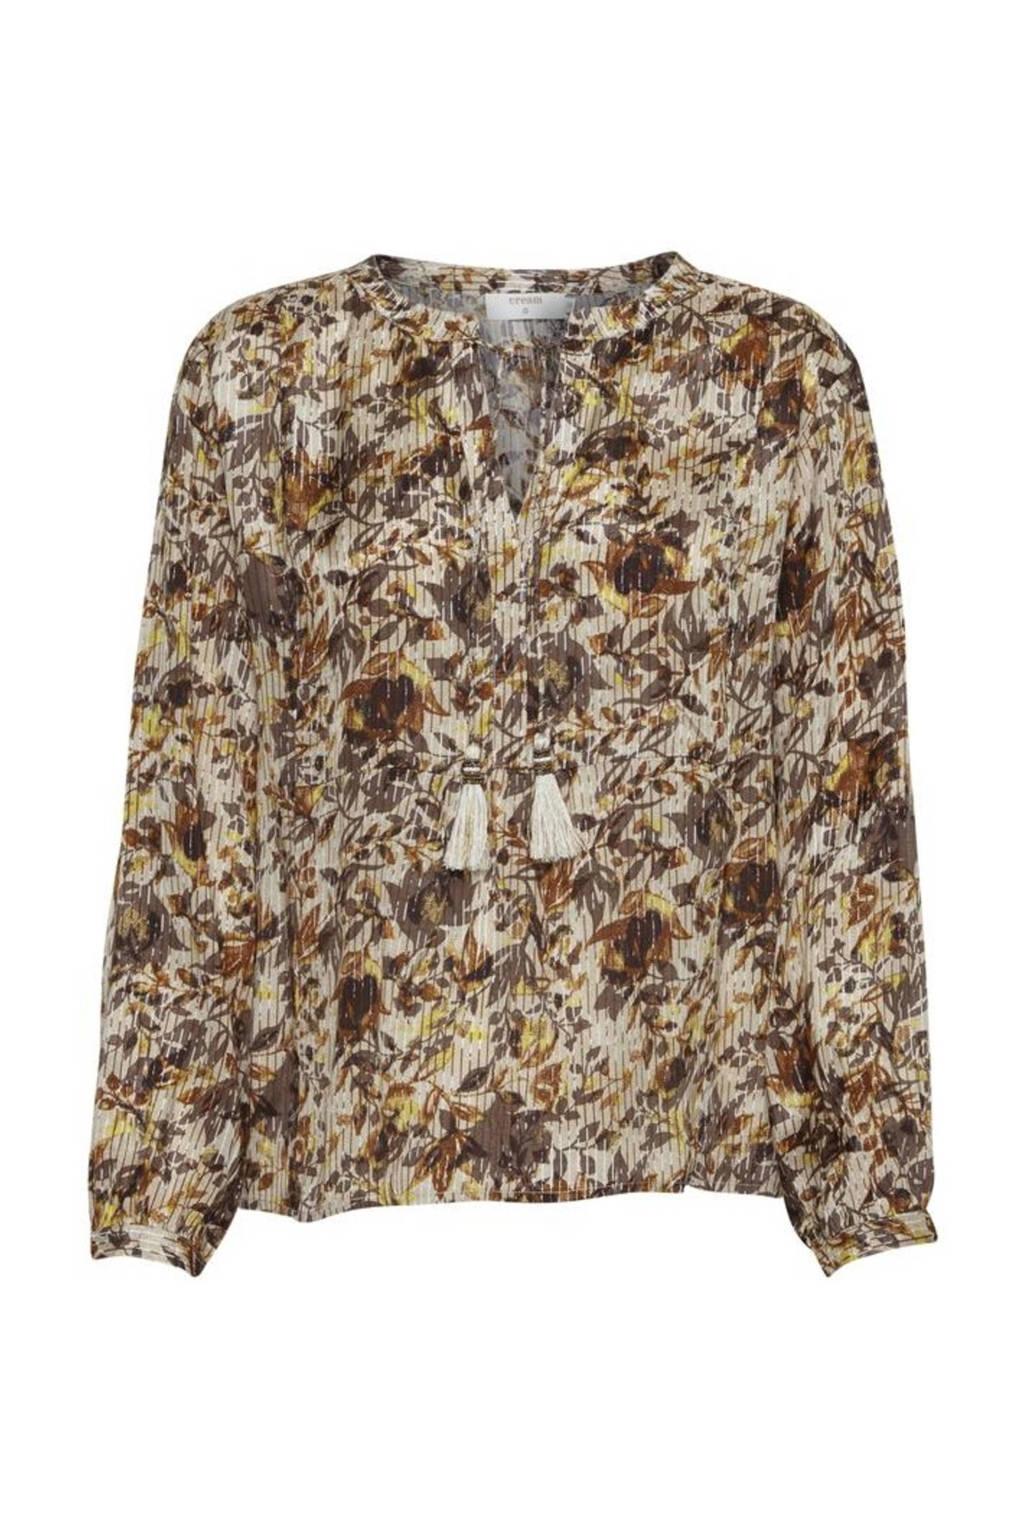 Cream blouse AugustaCR Blouse met all over print multi, Multi